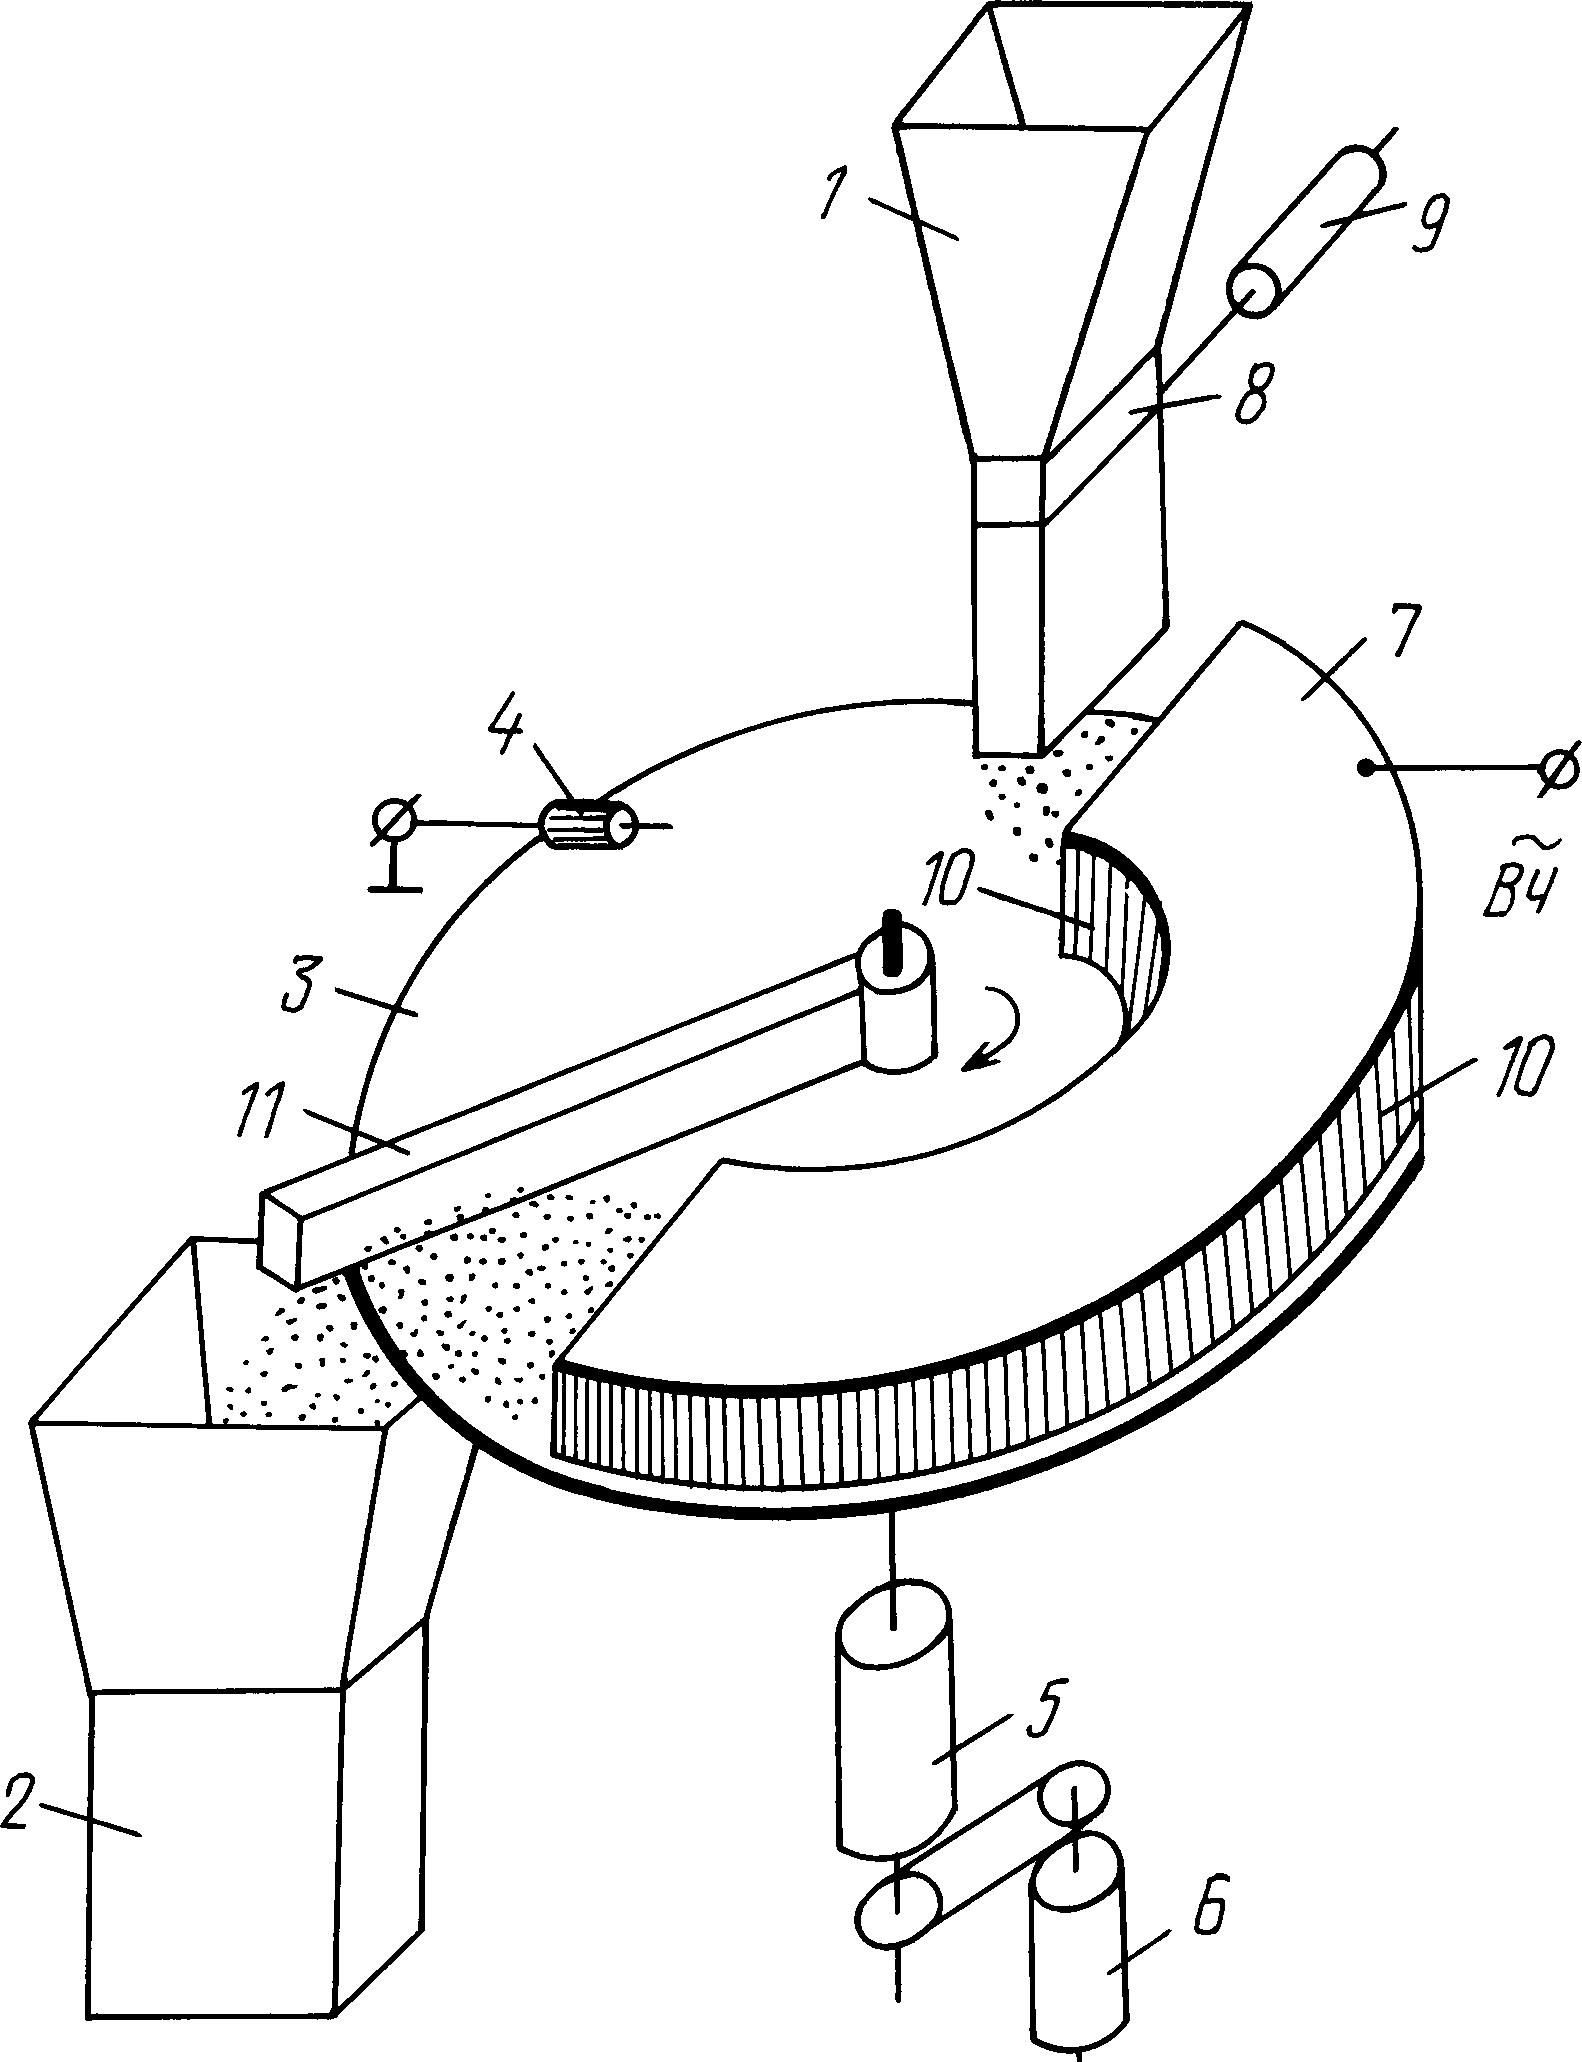 Устройство для шелушения зерна